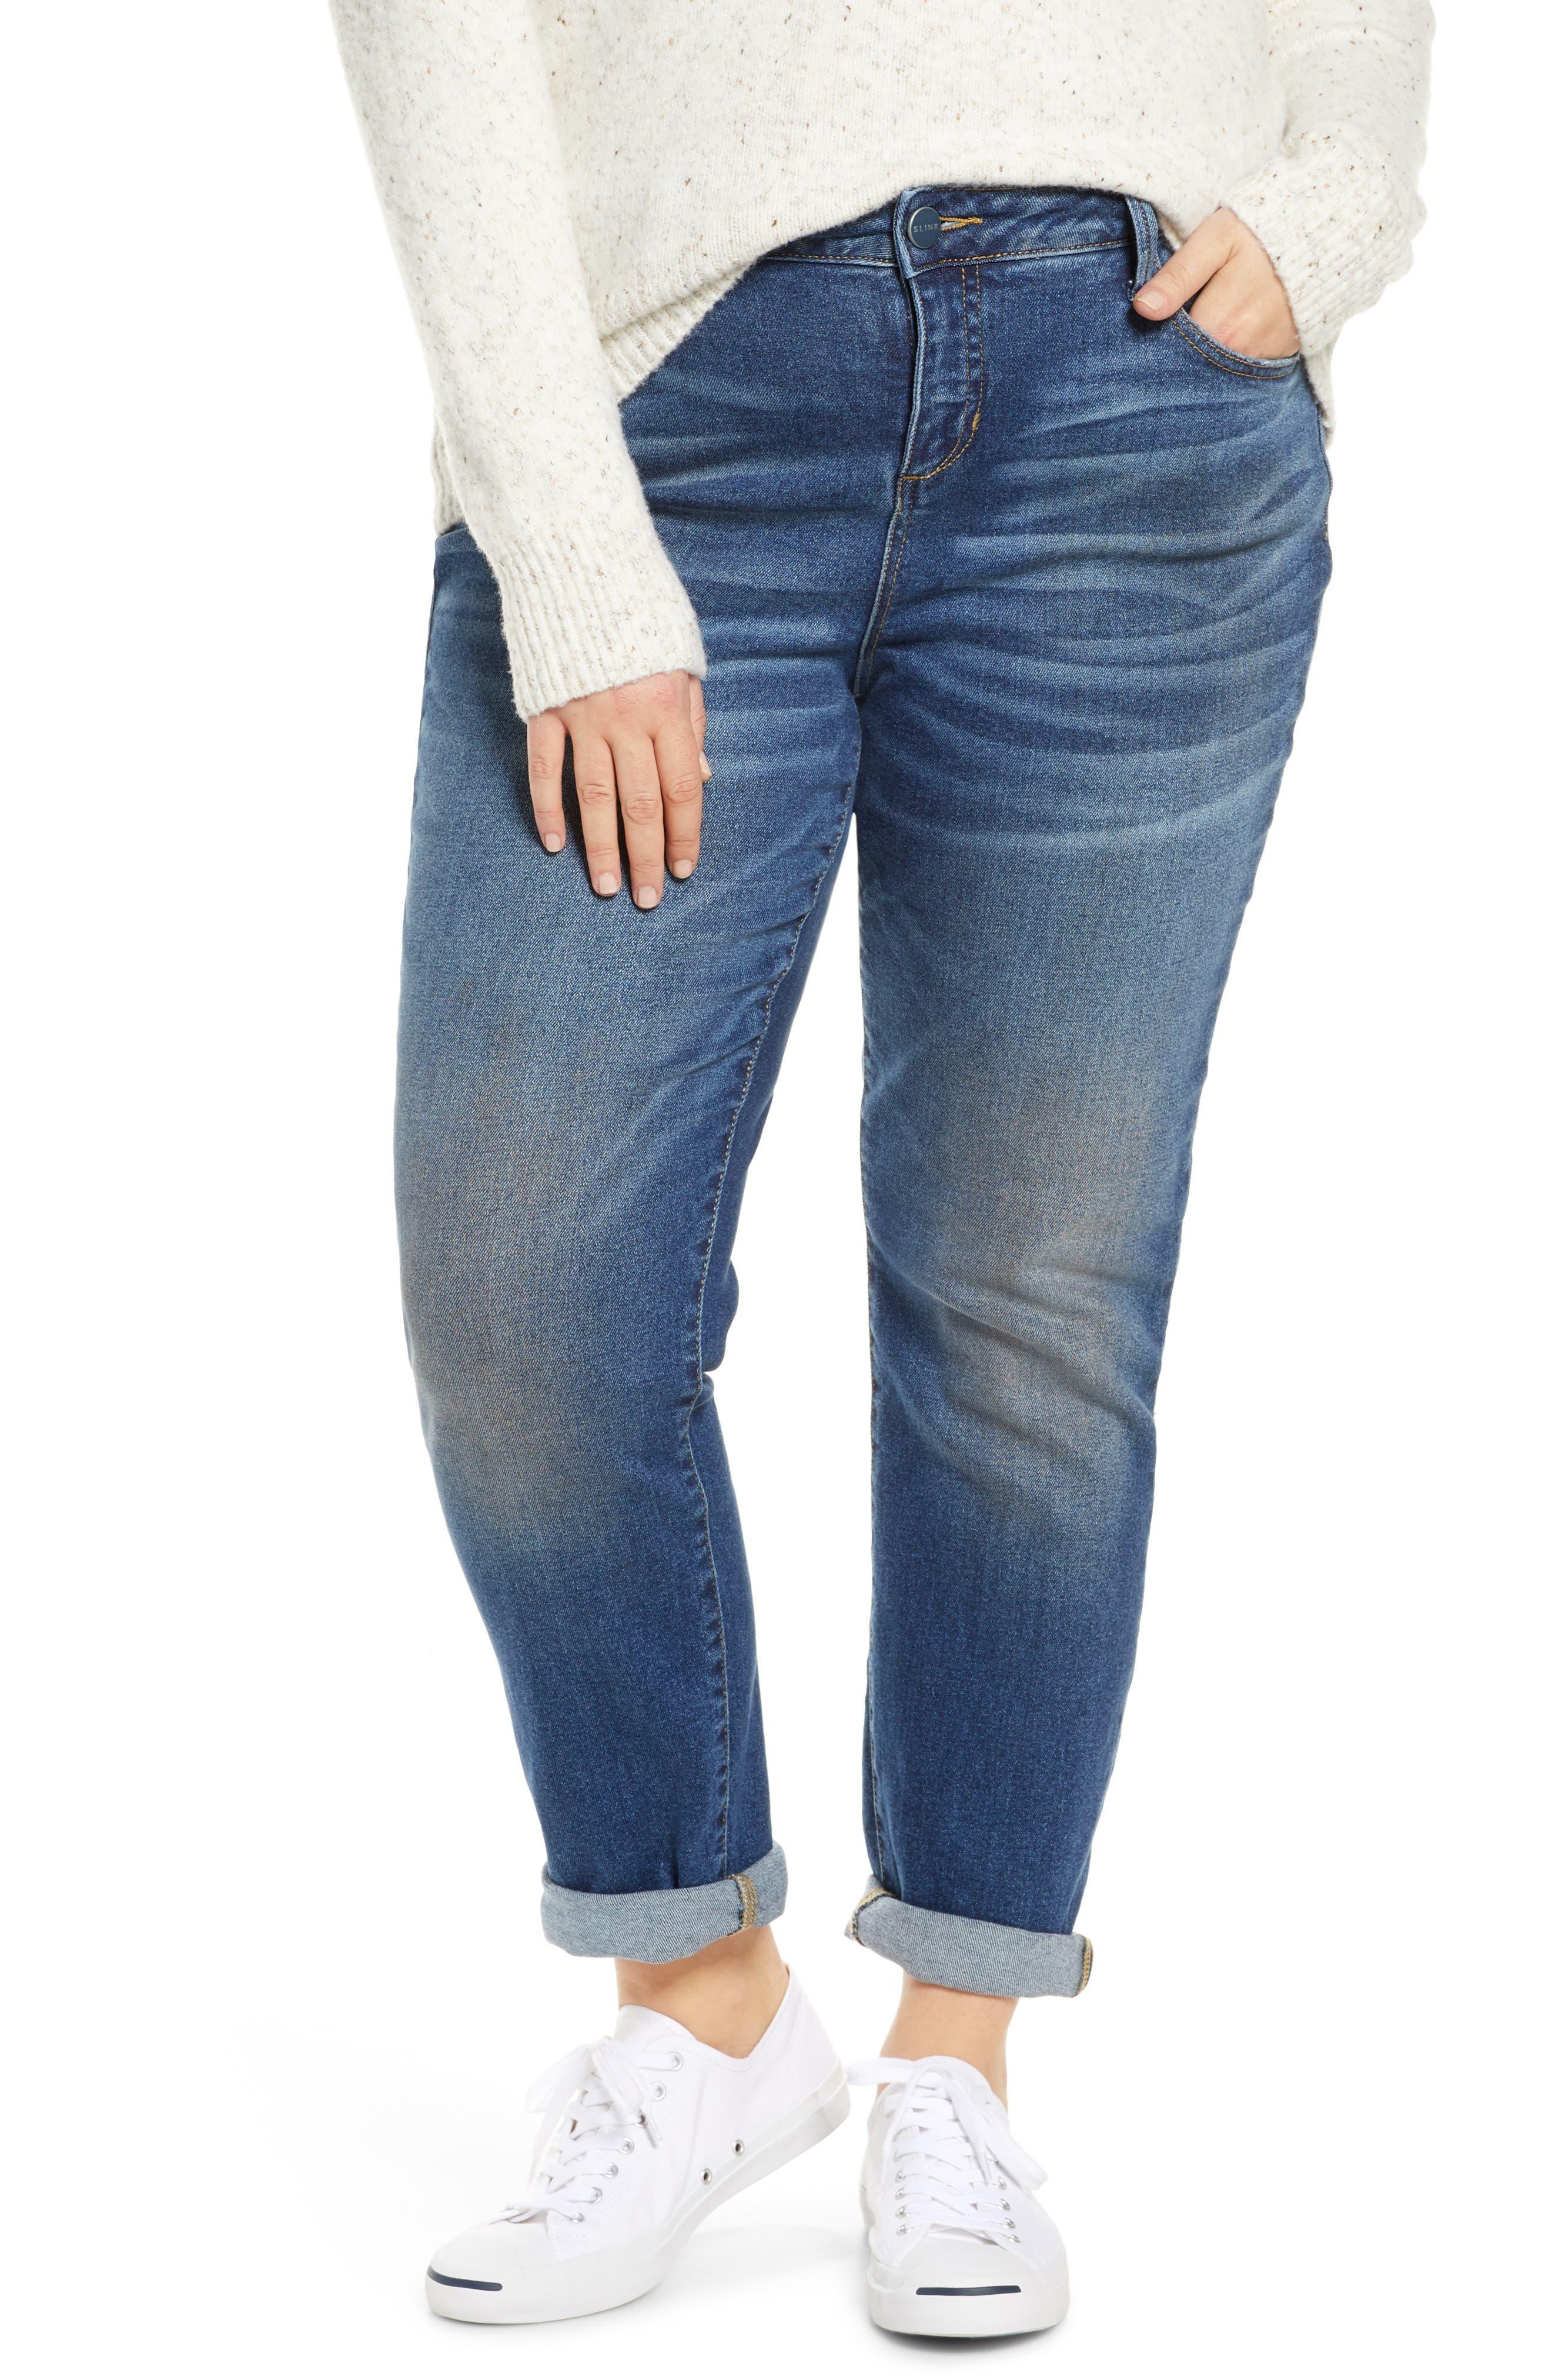 SLINK Jeans High Waist Boyfriend Jeans (Olivia) (Plus Size)